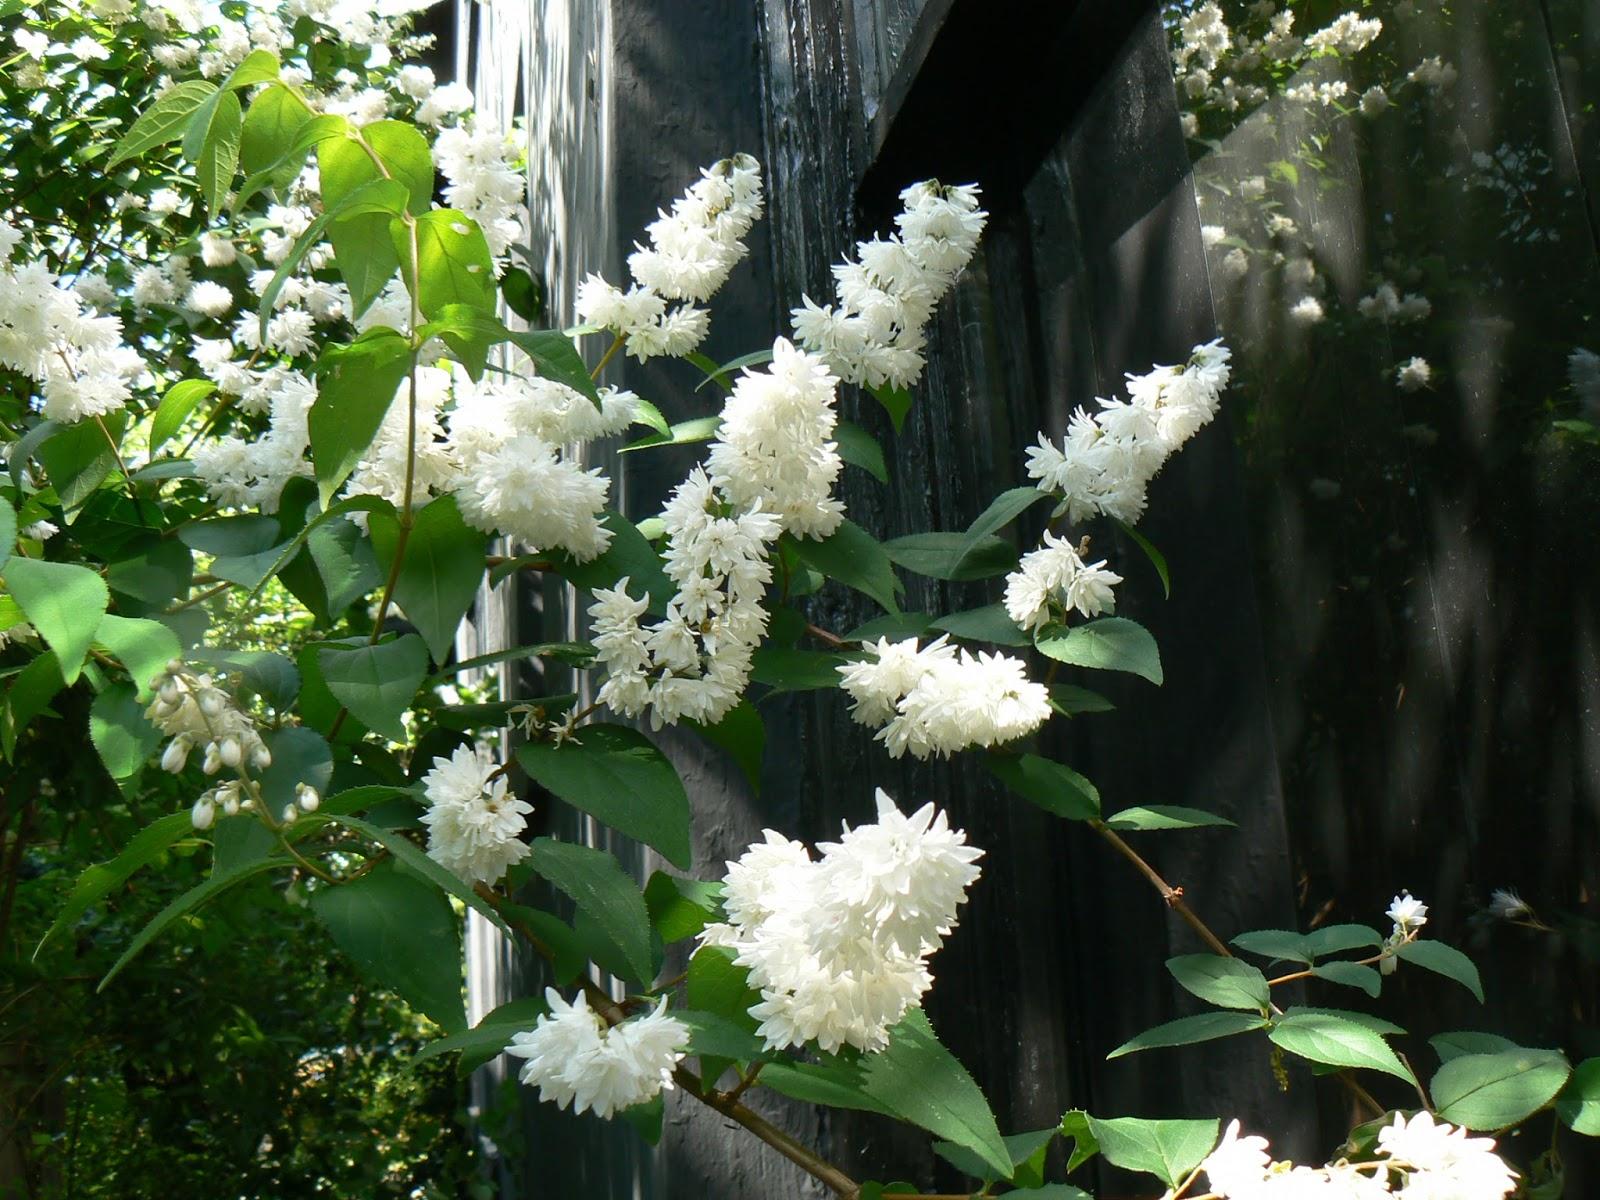 Garden Photo Of The Day Gather Ye Rosebuds